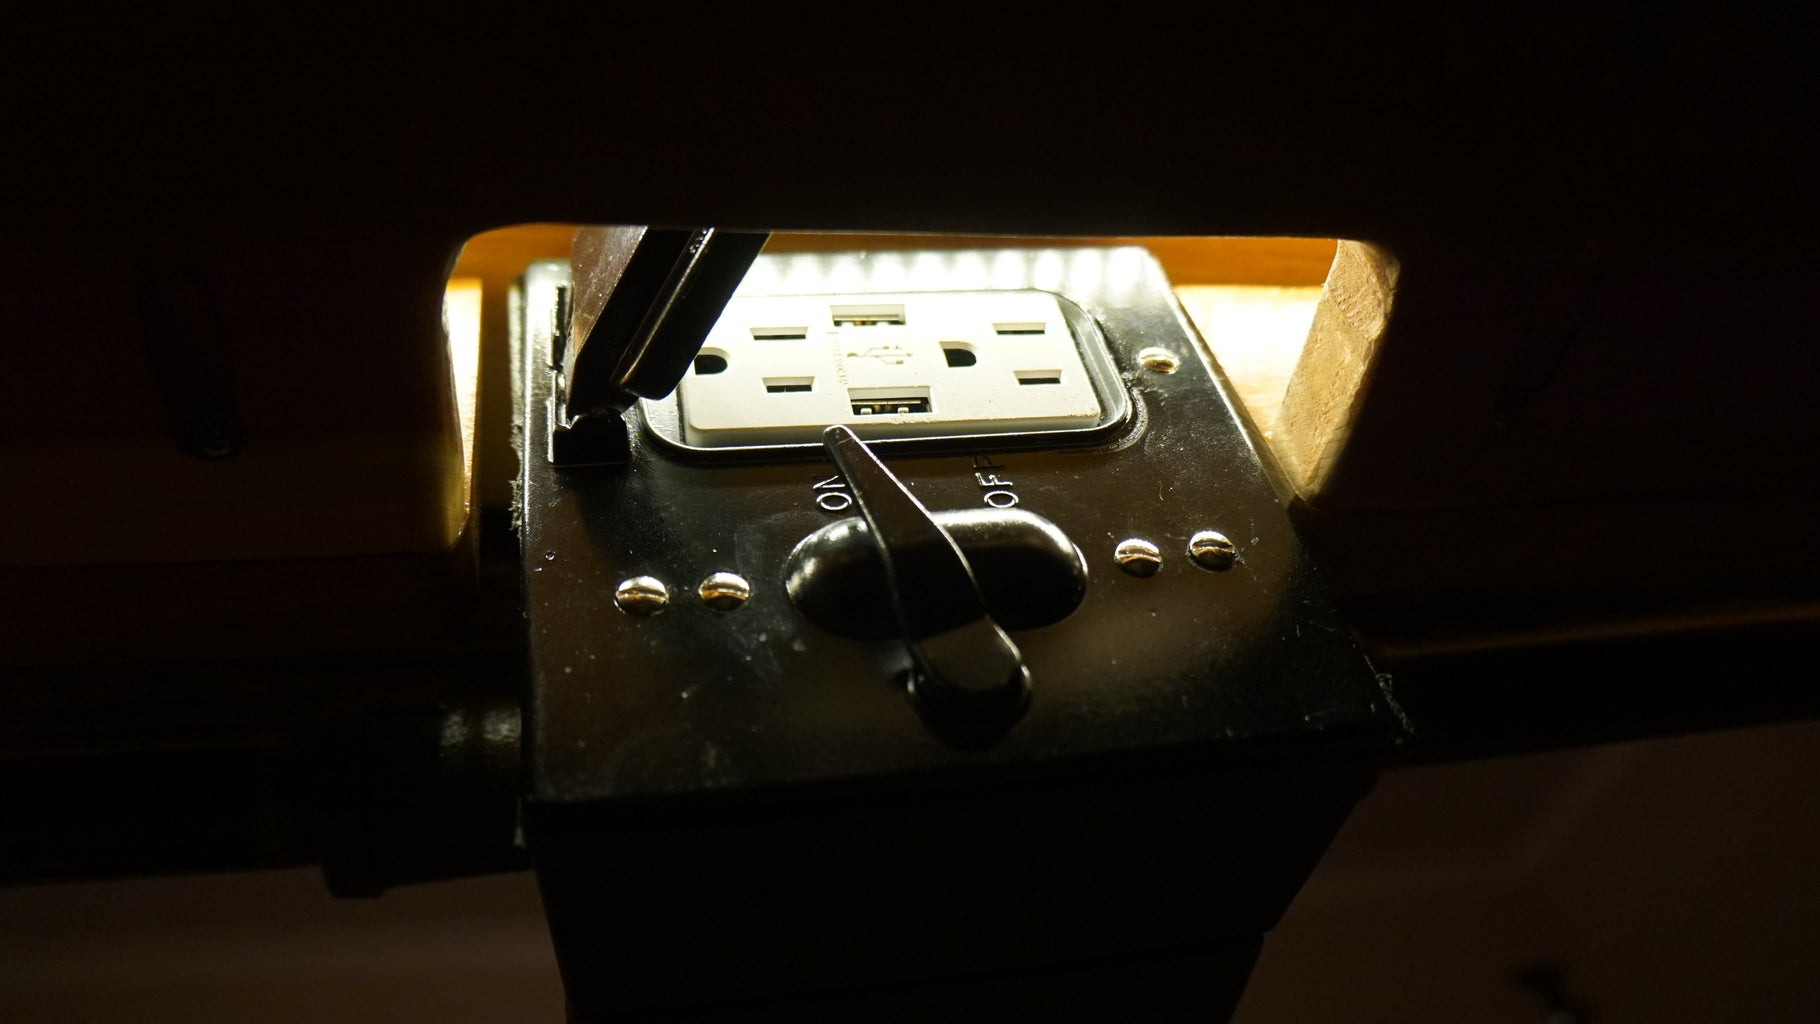 Electrifying the Desk